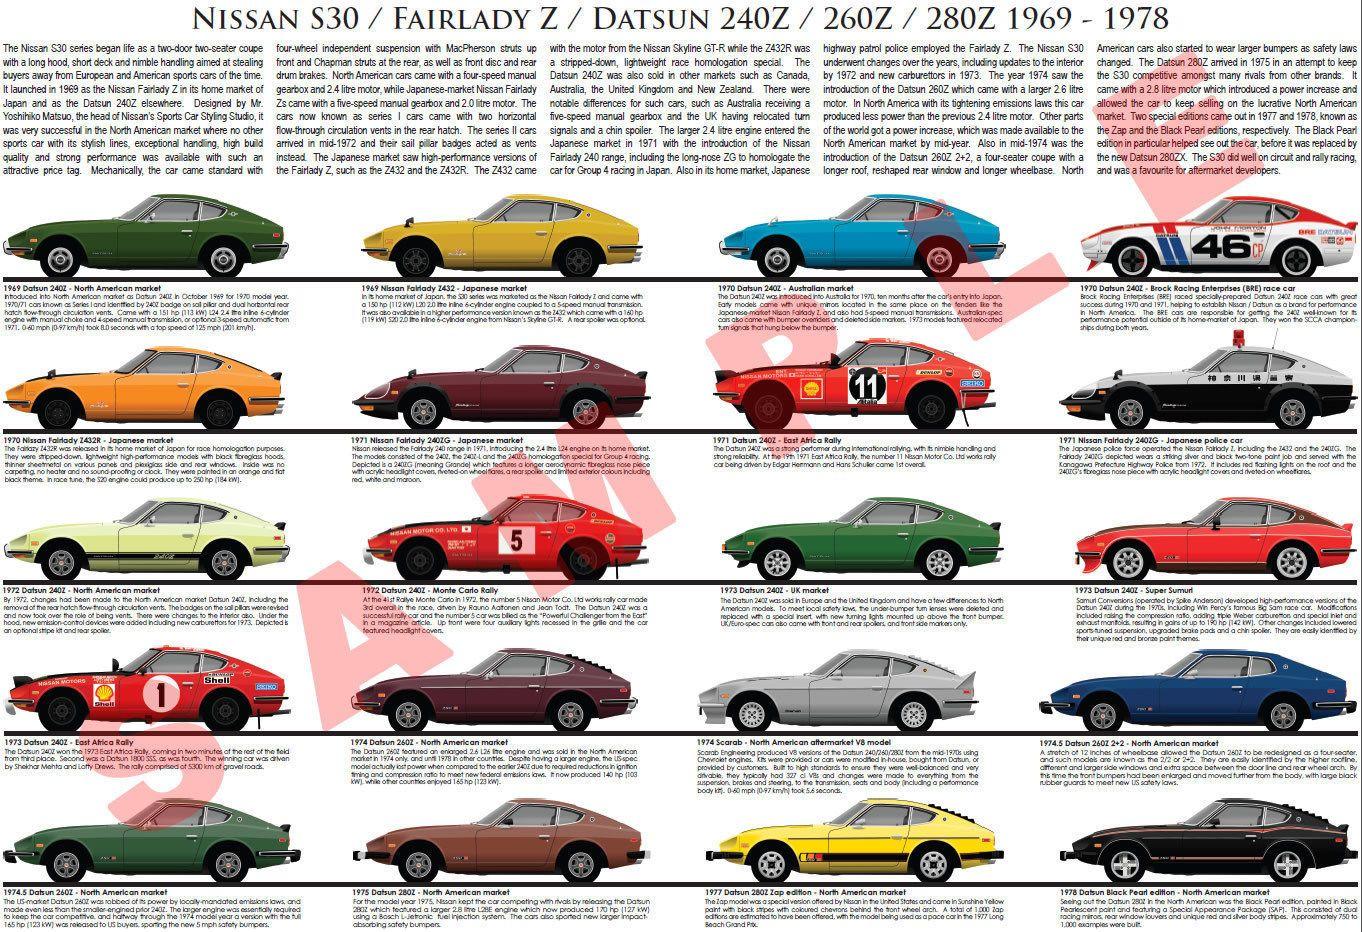 Datsun 240z Nissan Fairlady Z Model Chart Poster Bre Big Sam 1973 Wiring Diagram Http Ebaycom Itm